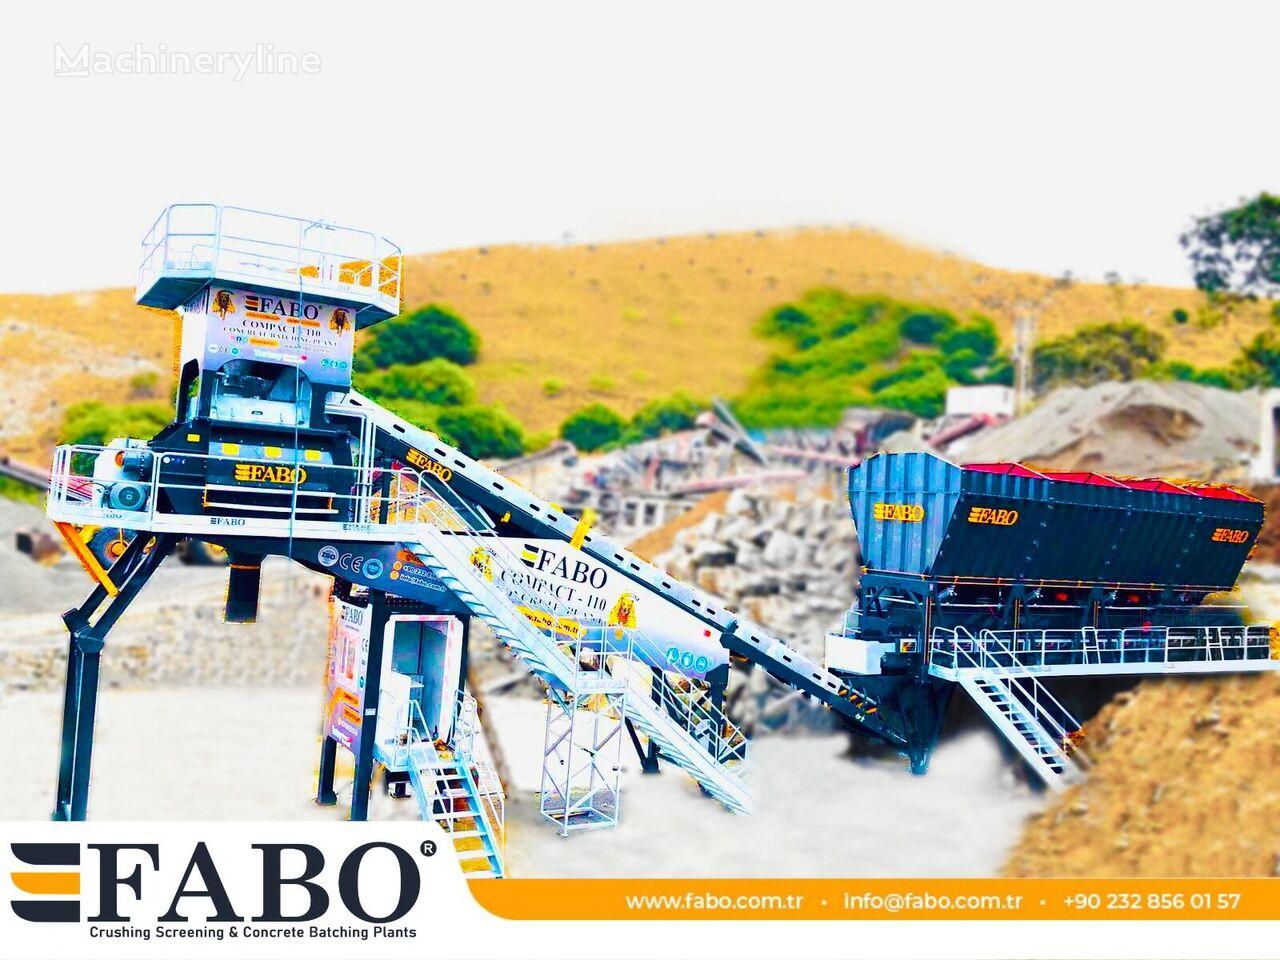 pabrik beton FABO  FABOMIX COMPACT-110 CONCRETE PLANT | CONVEYOR TYPE baru